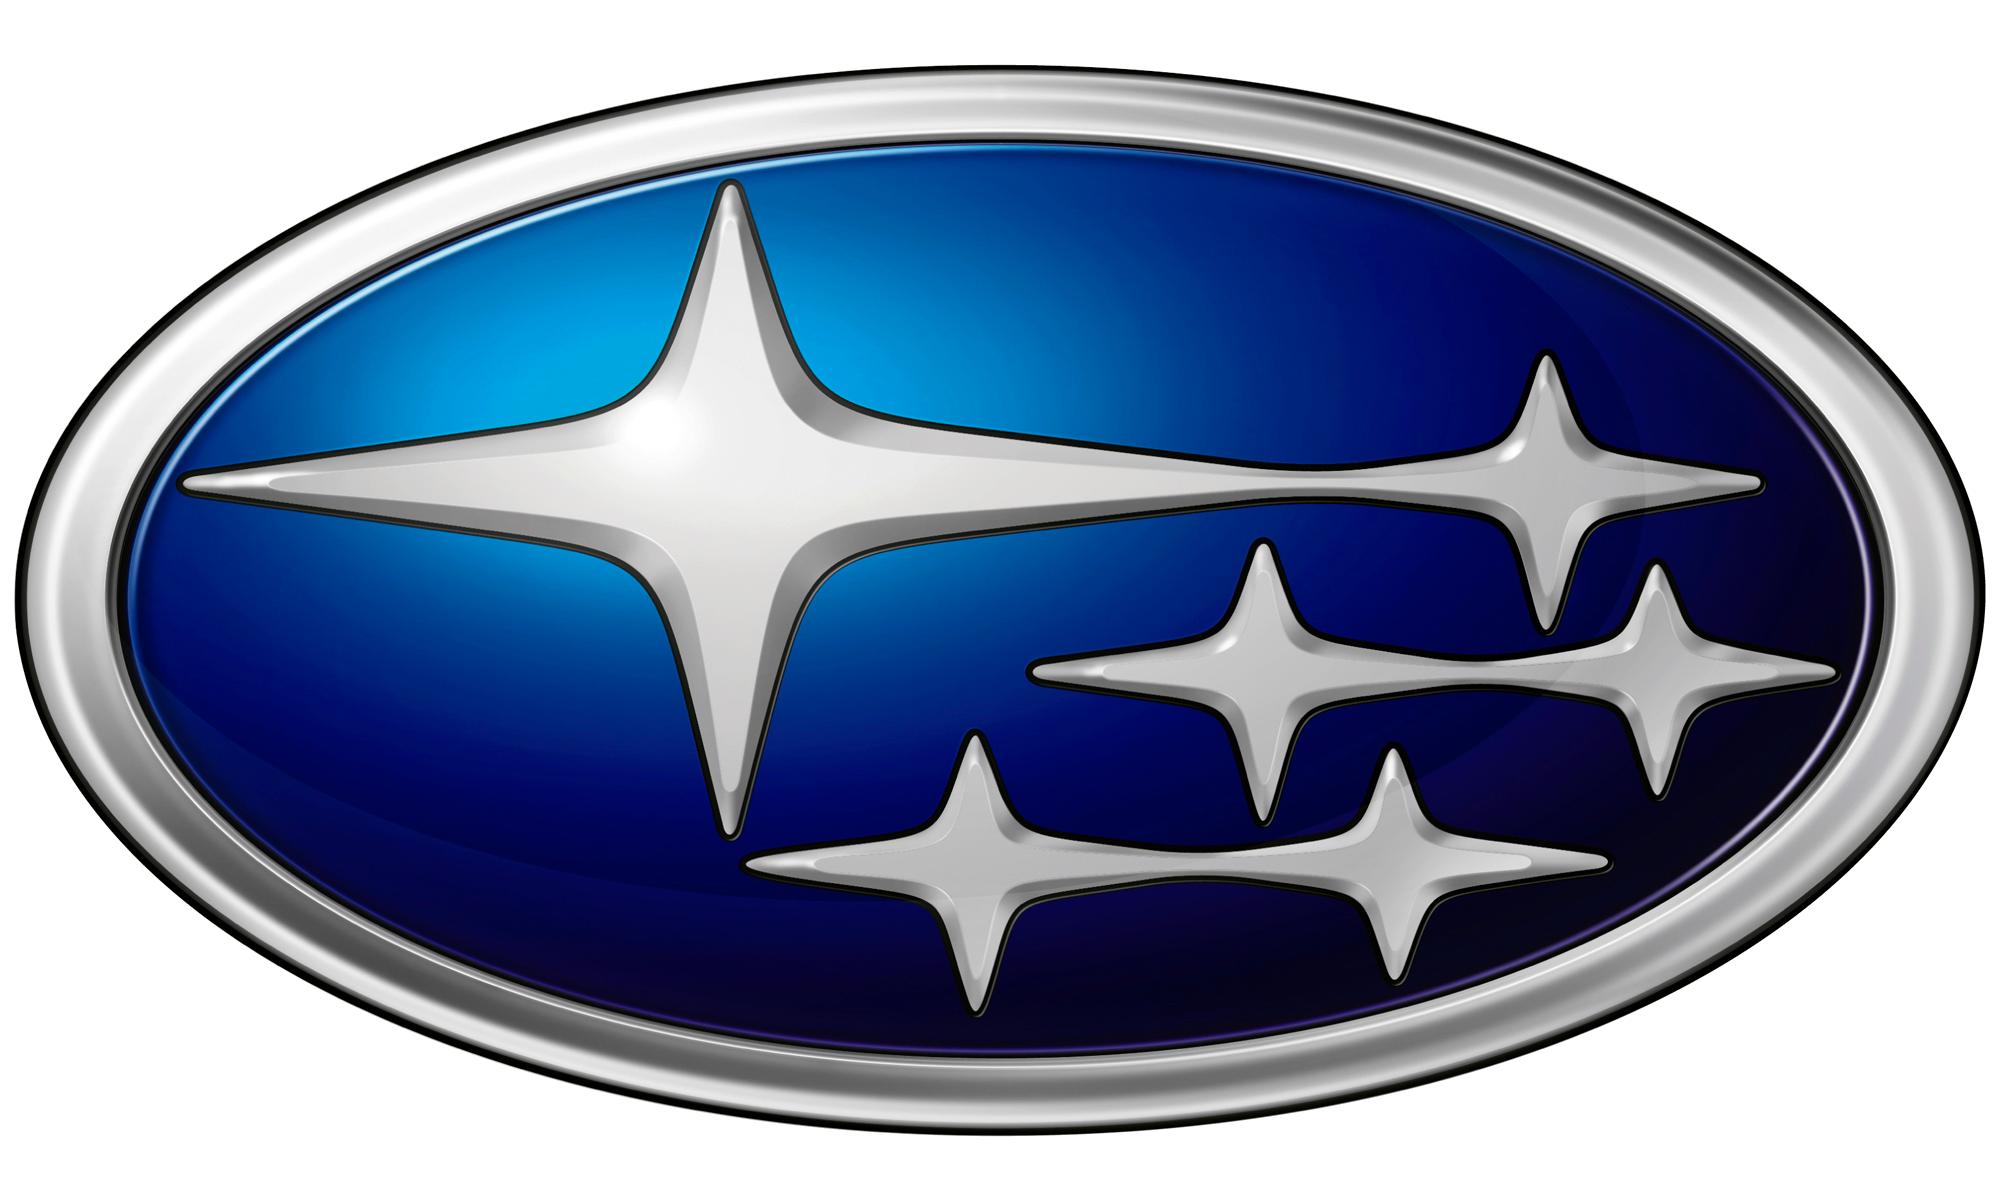 car-logo-png1669.png